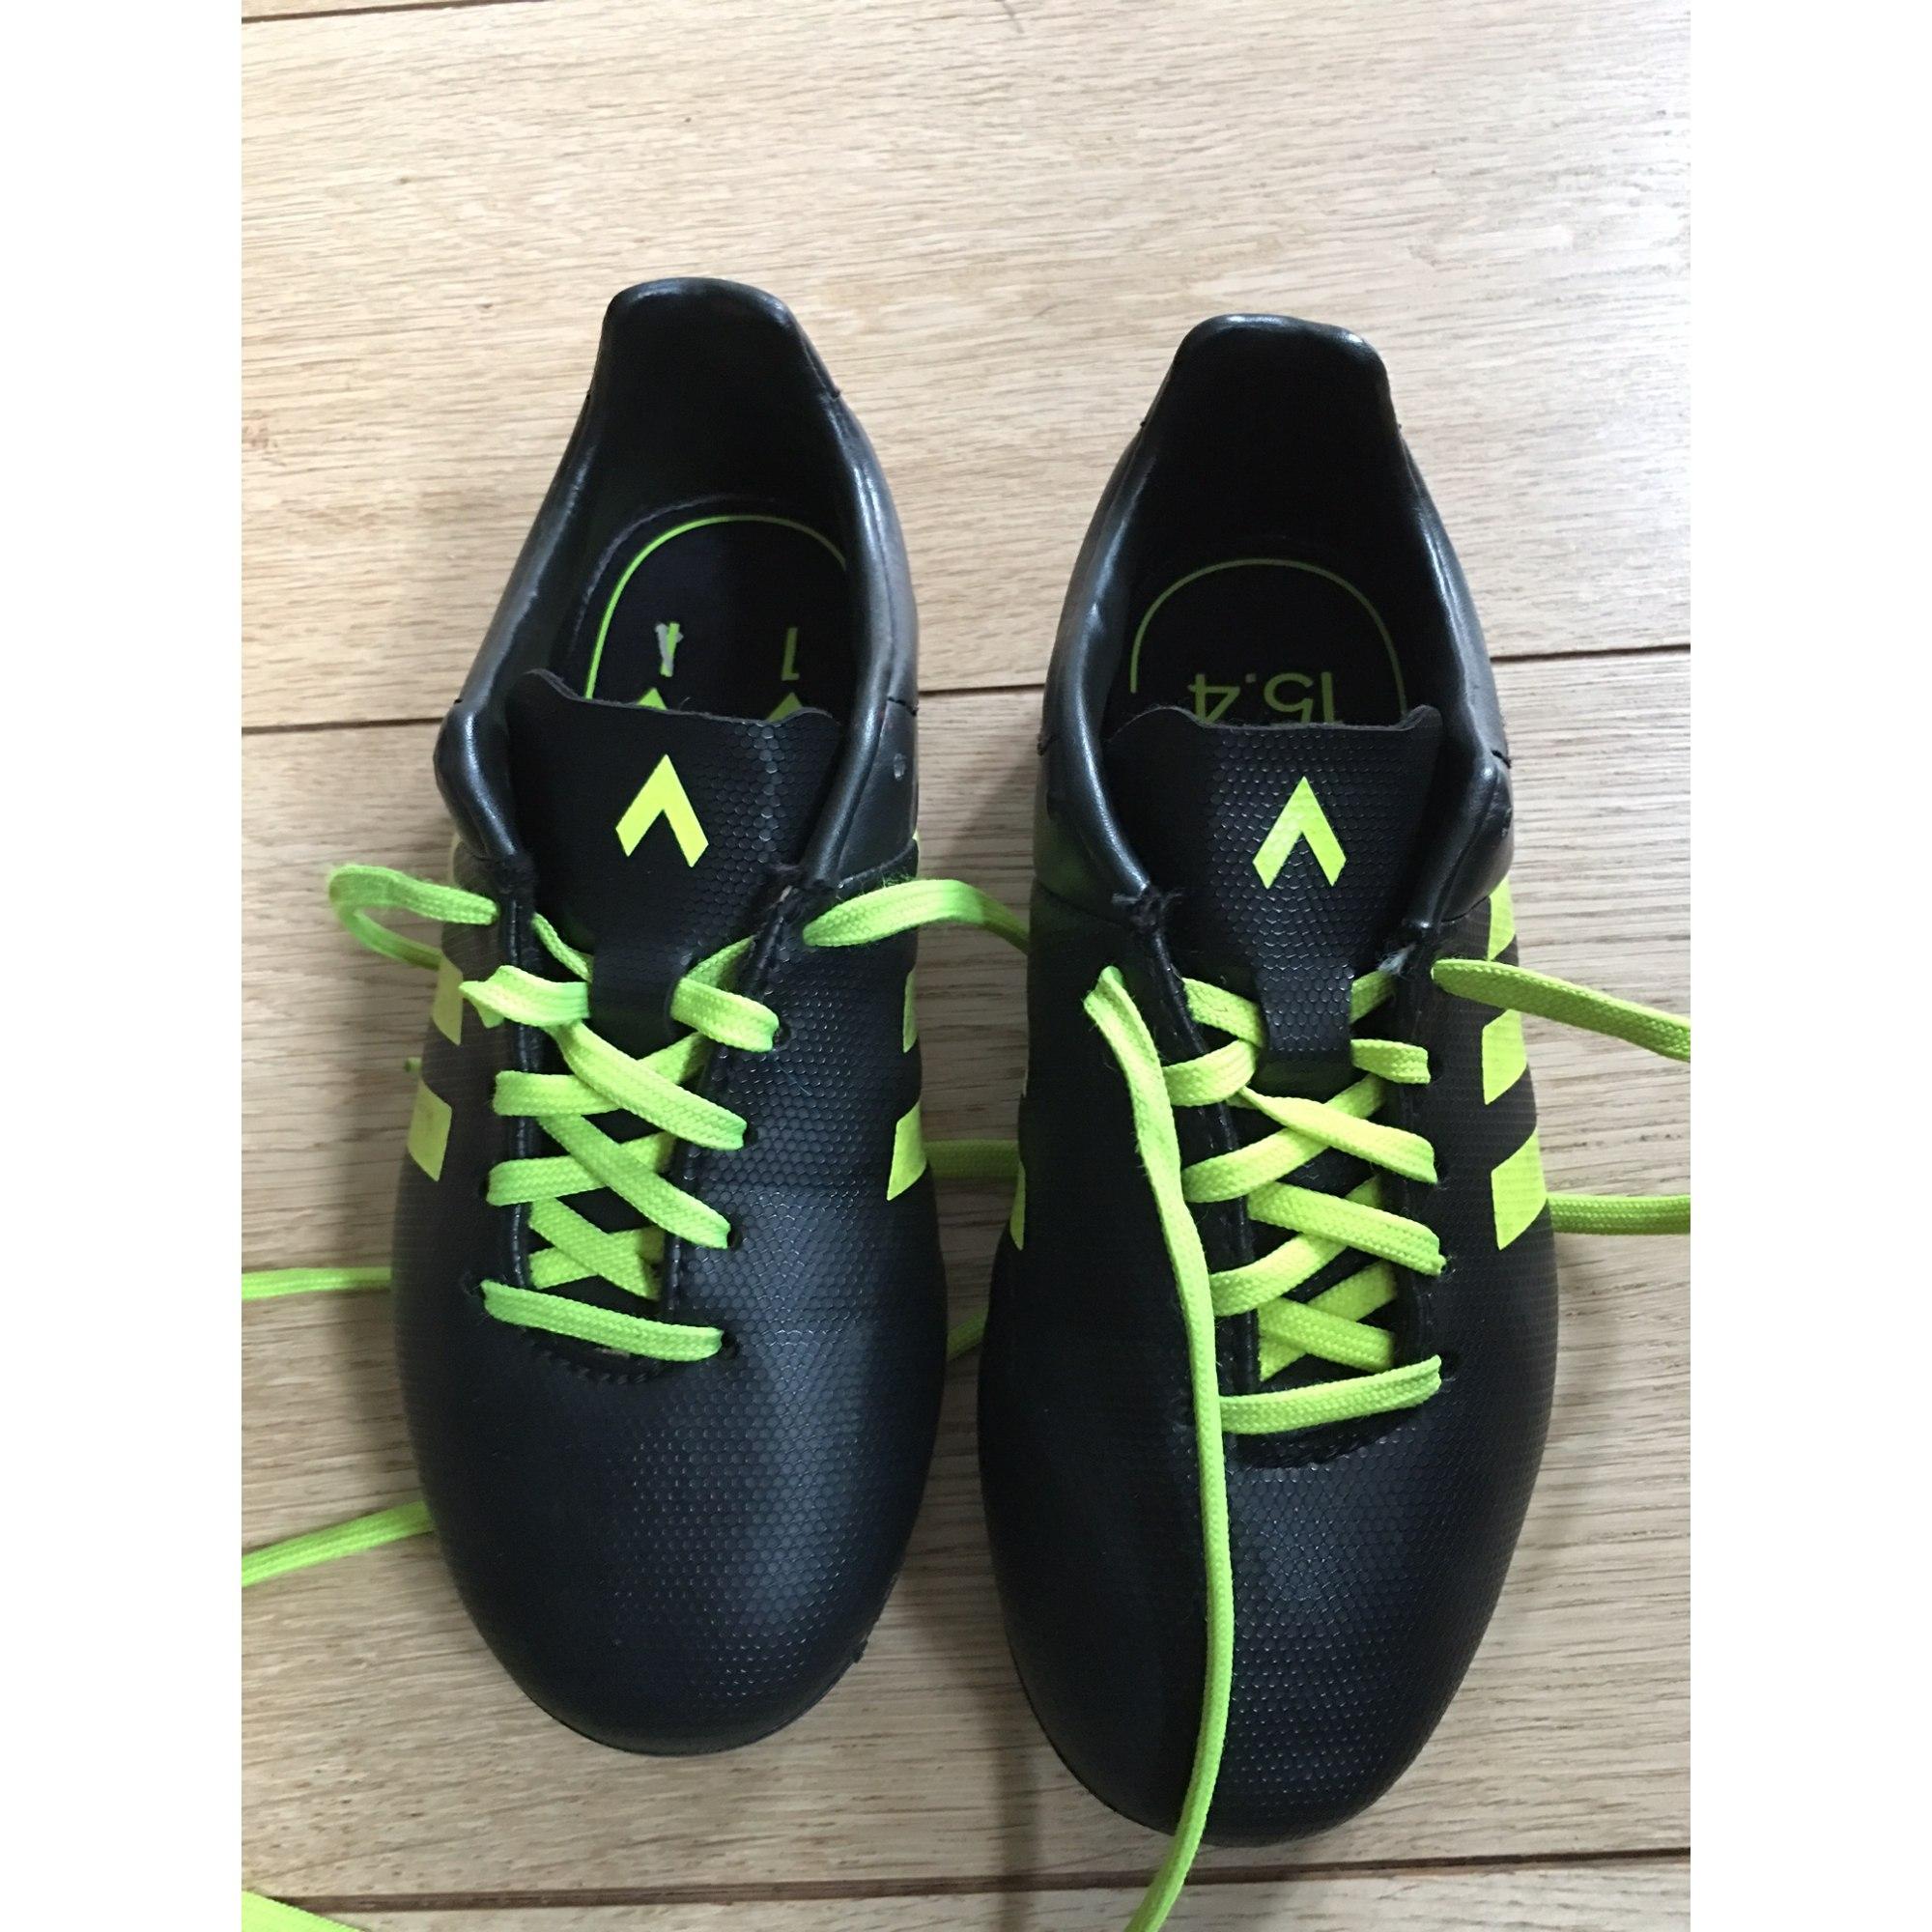 De Multicouleur Chaussures Sport 6301958 31 Adidas EDWHY2I9